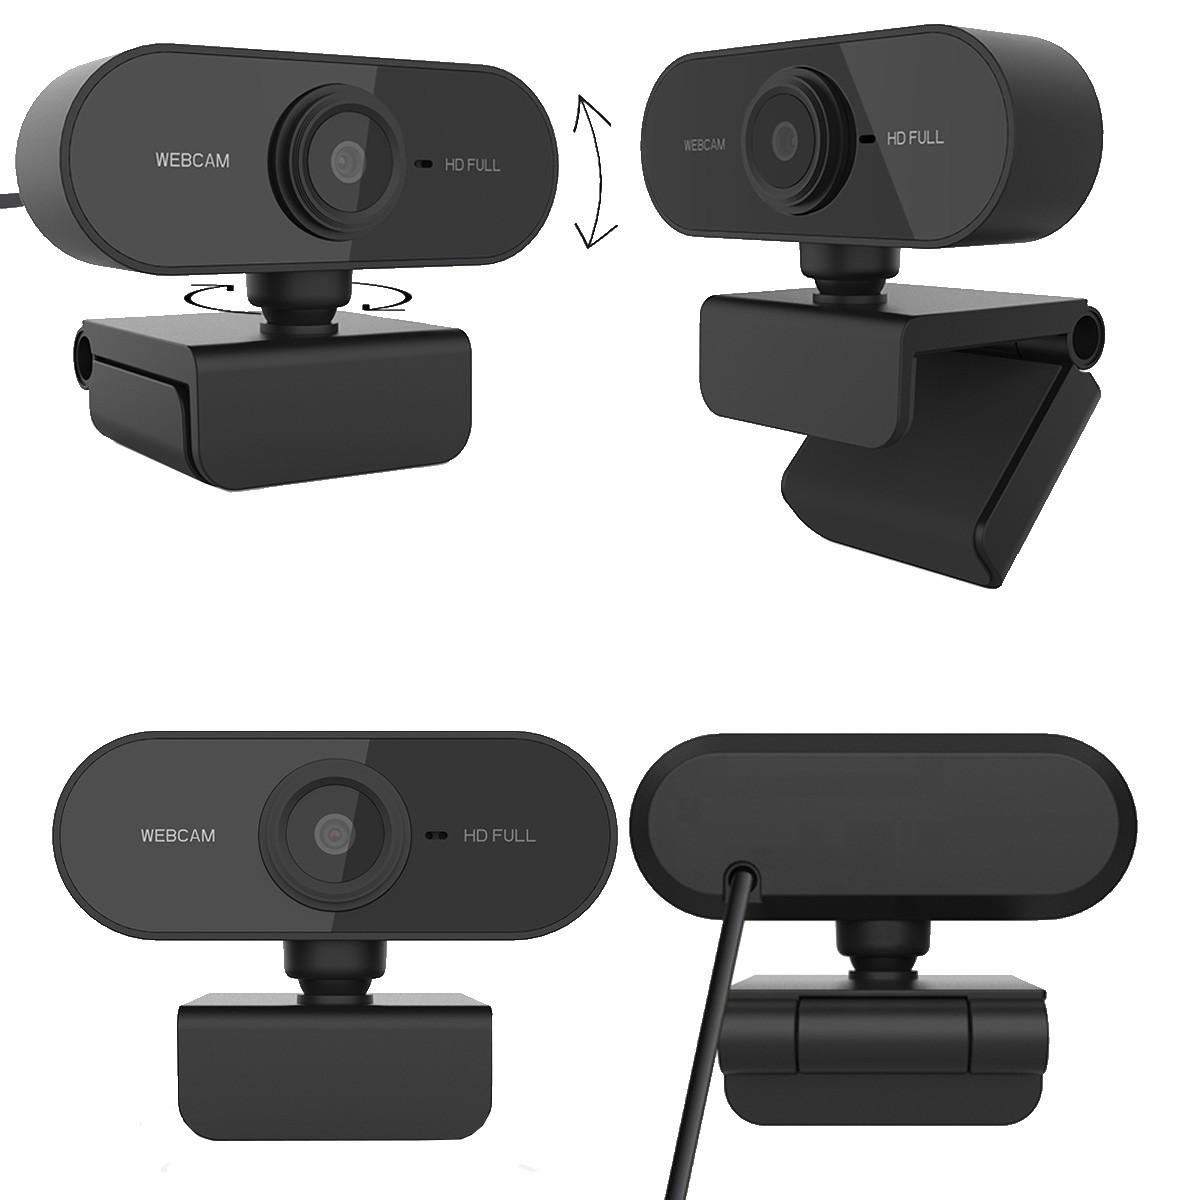 Webcam FULL HD 1080p com Microfone USB 2.0